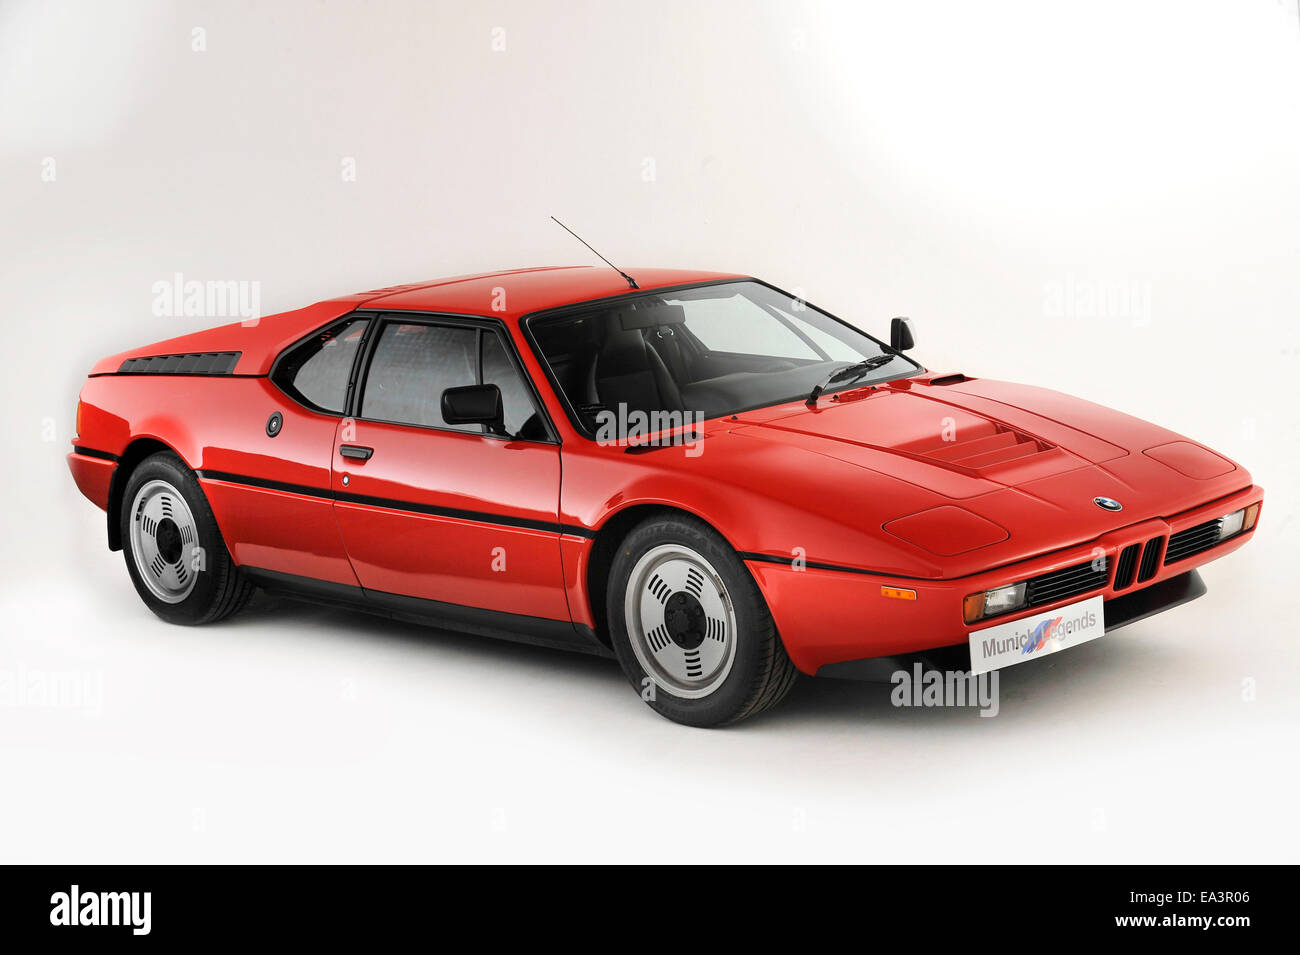 1980 BMW M1 - Stock Image